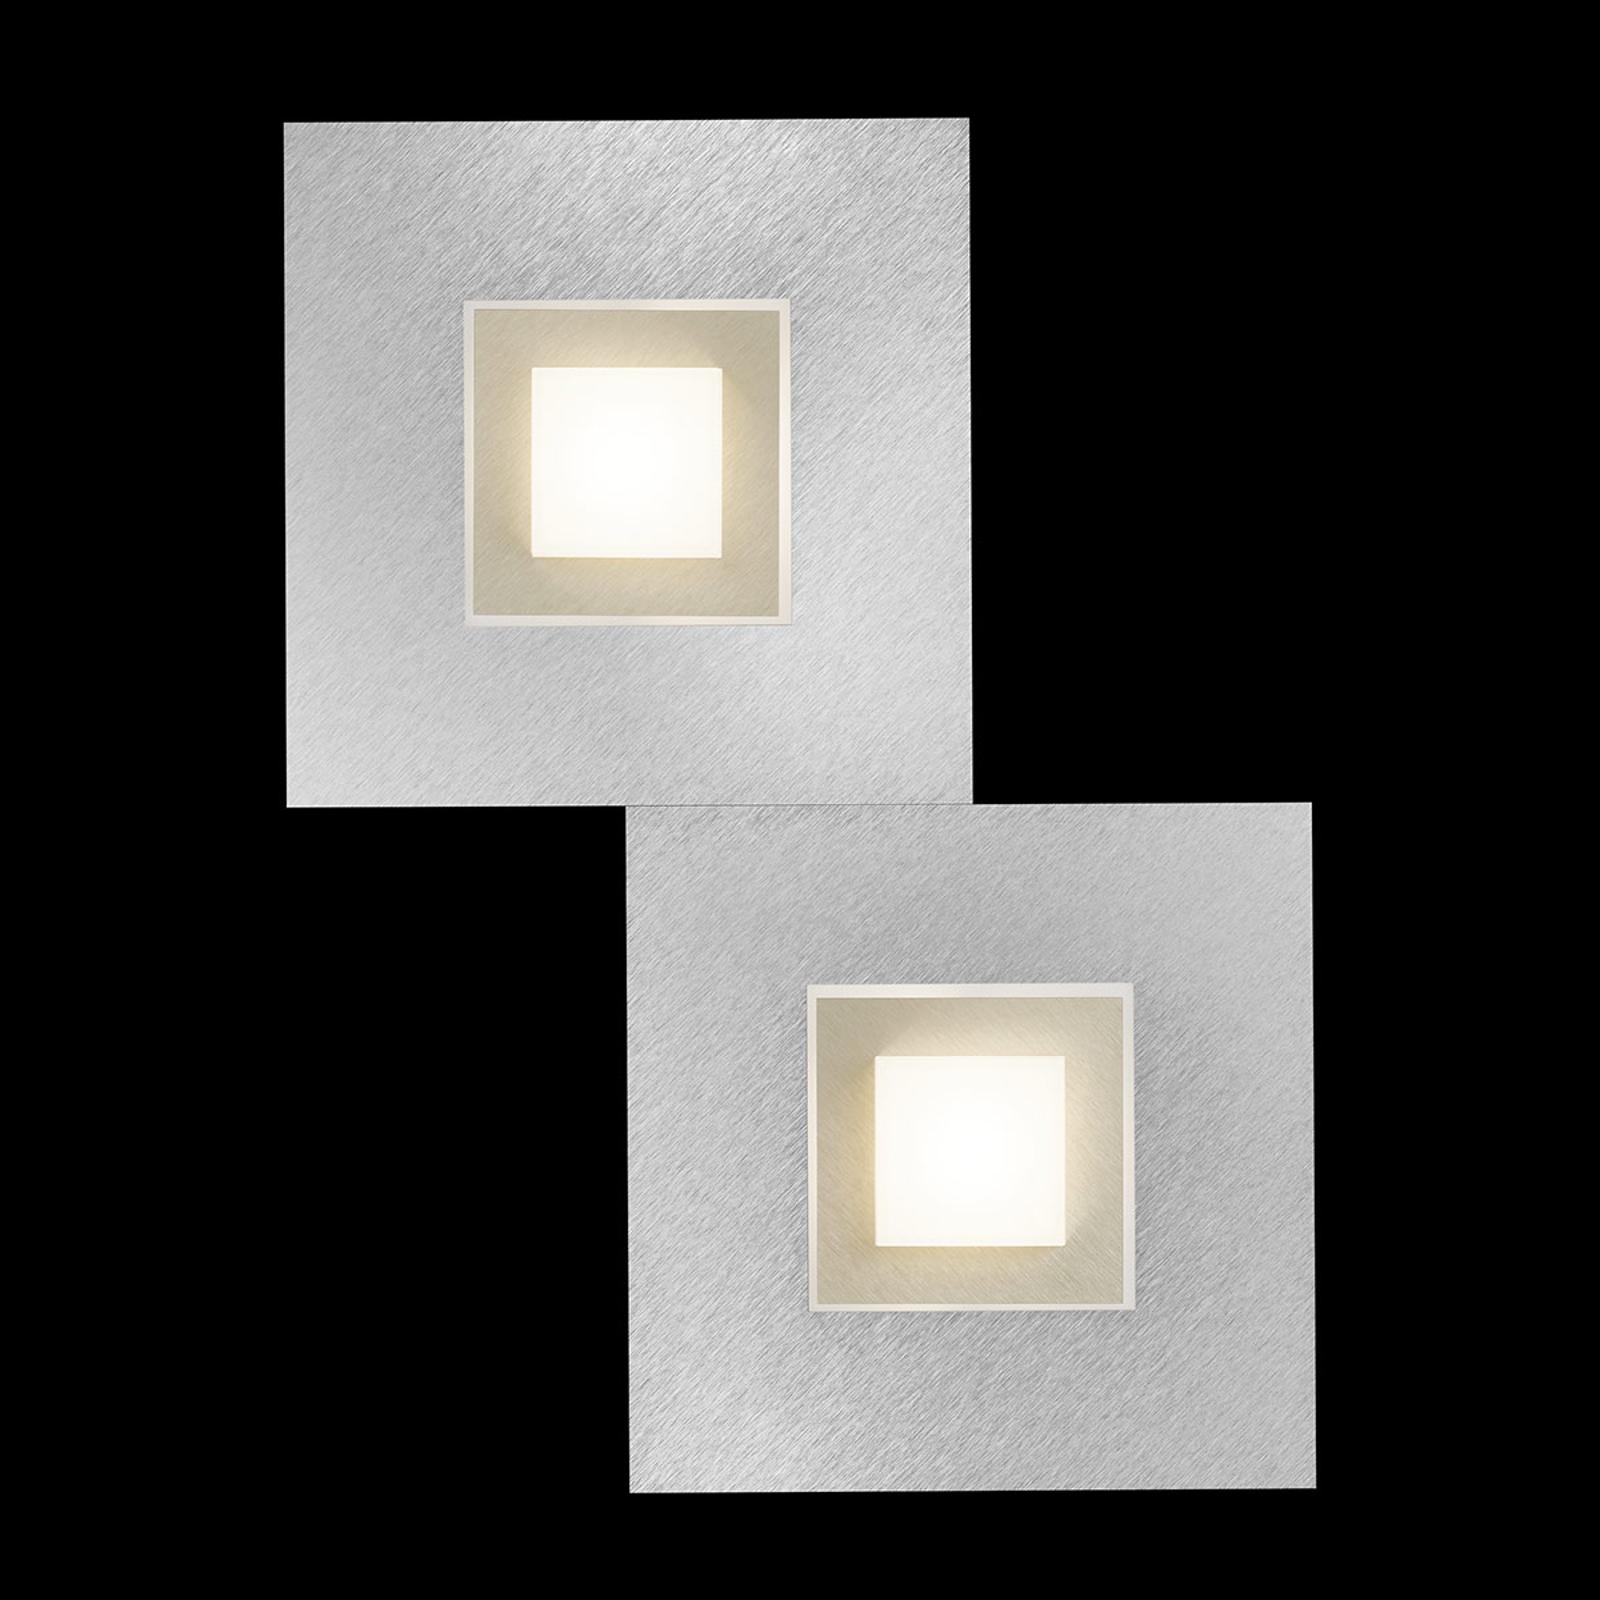 GROSSMANN Karree LED-Wandleuchte, 2fl. champagner